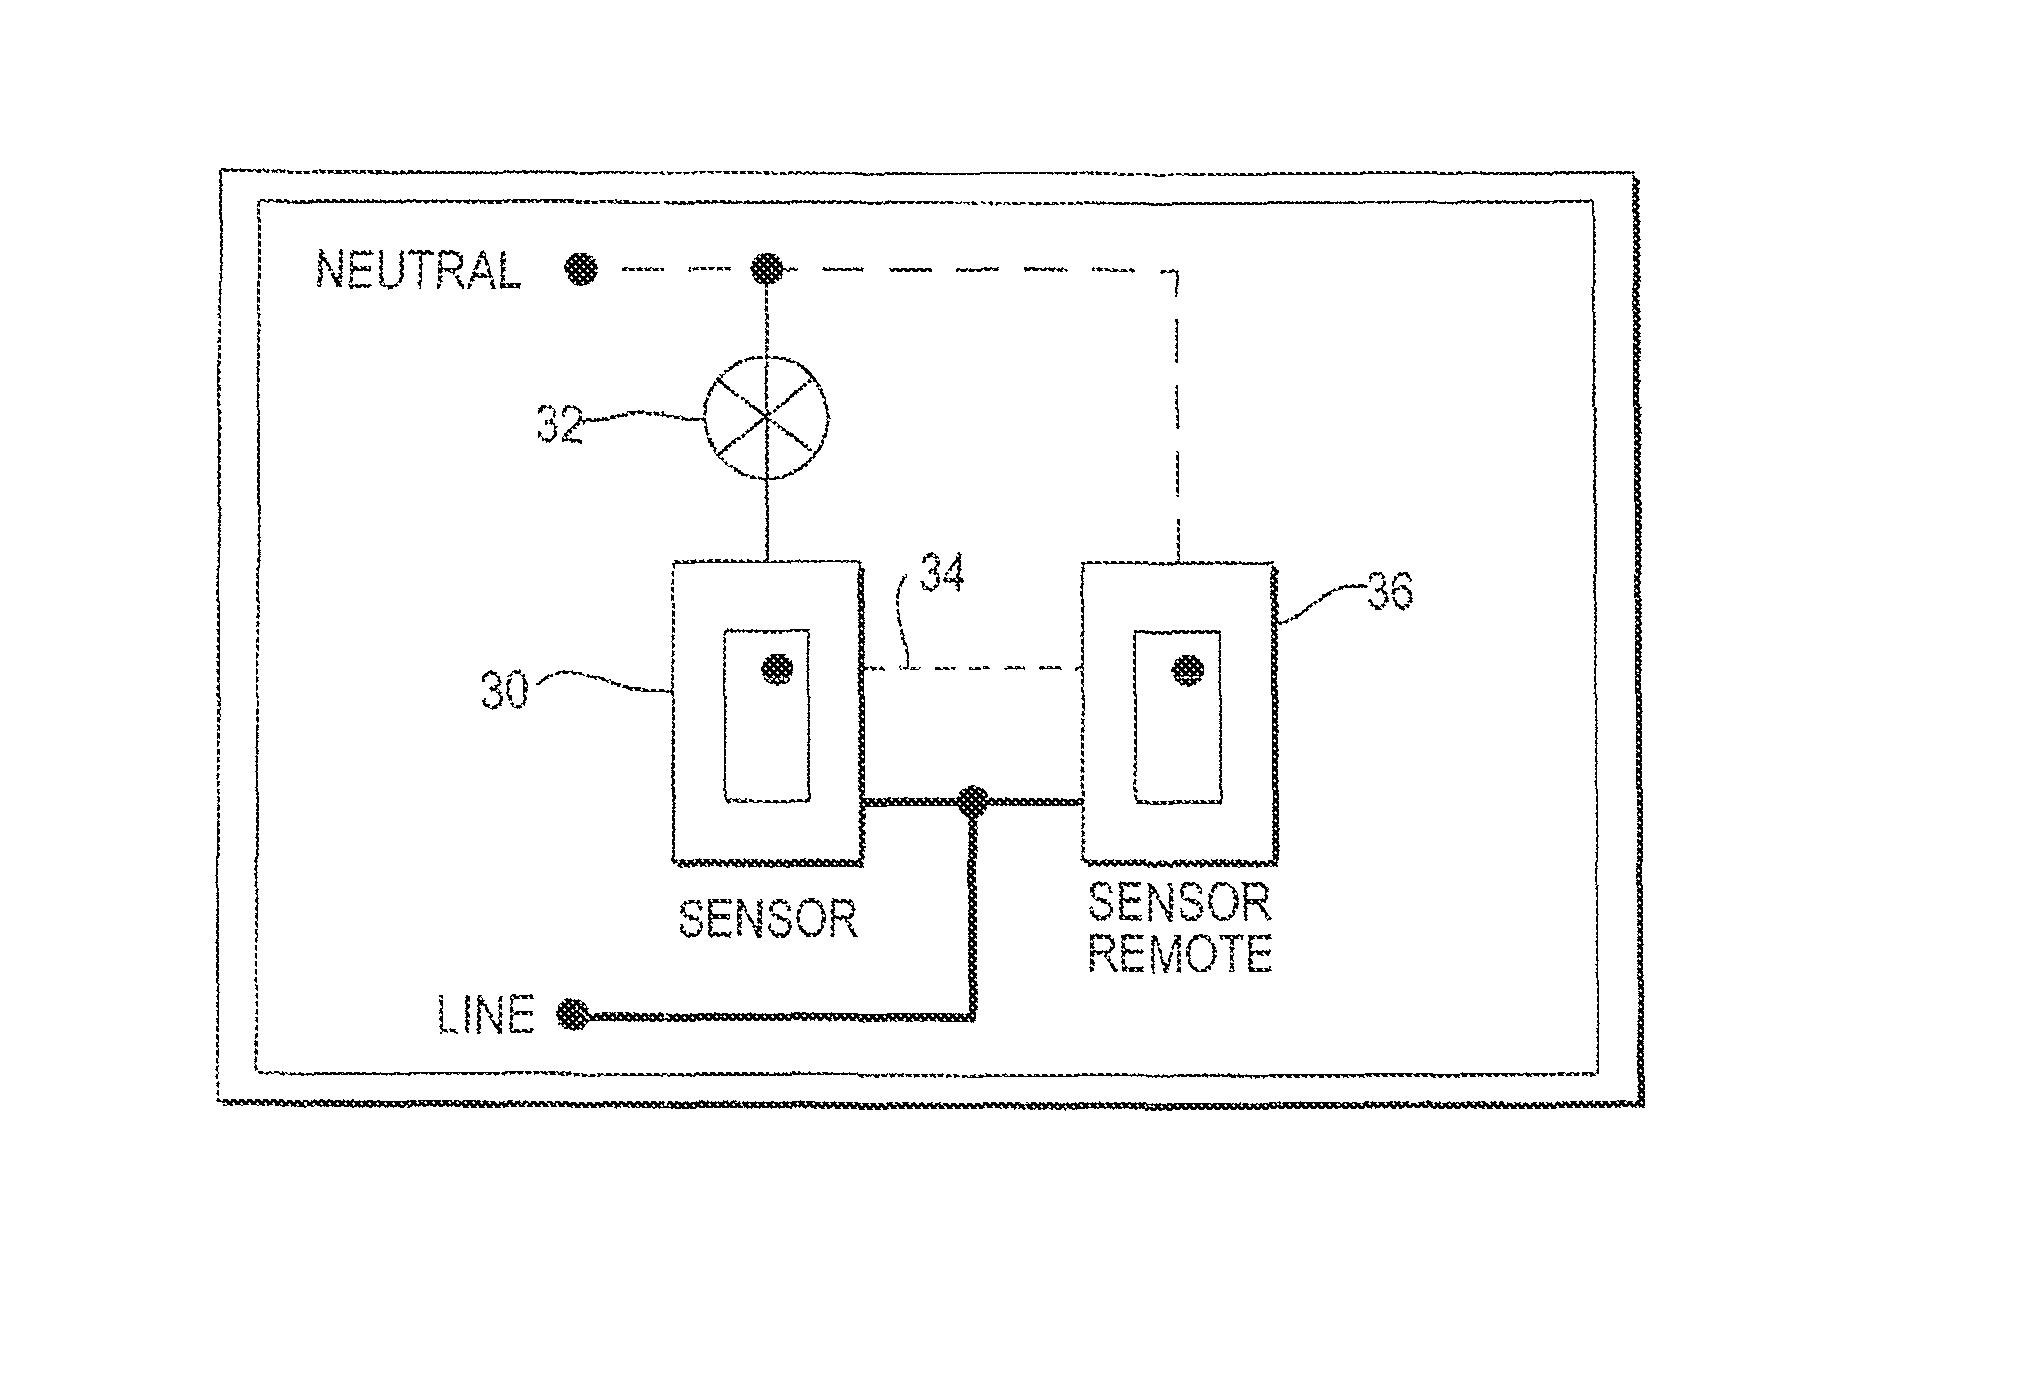 US08018166 20110913 D00000?resize\=665%2C456 kickstart ks1 wiring diagram speedo wiring diagram \u2022 wiring  at webbmarketing.co